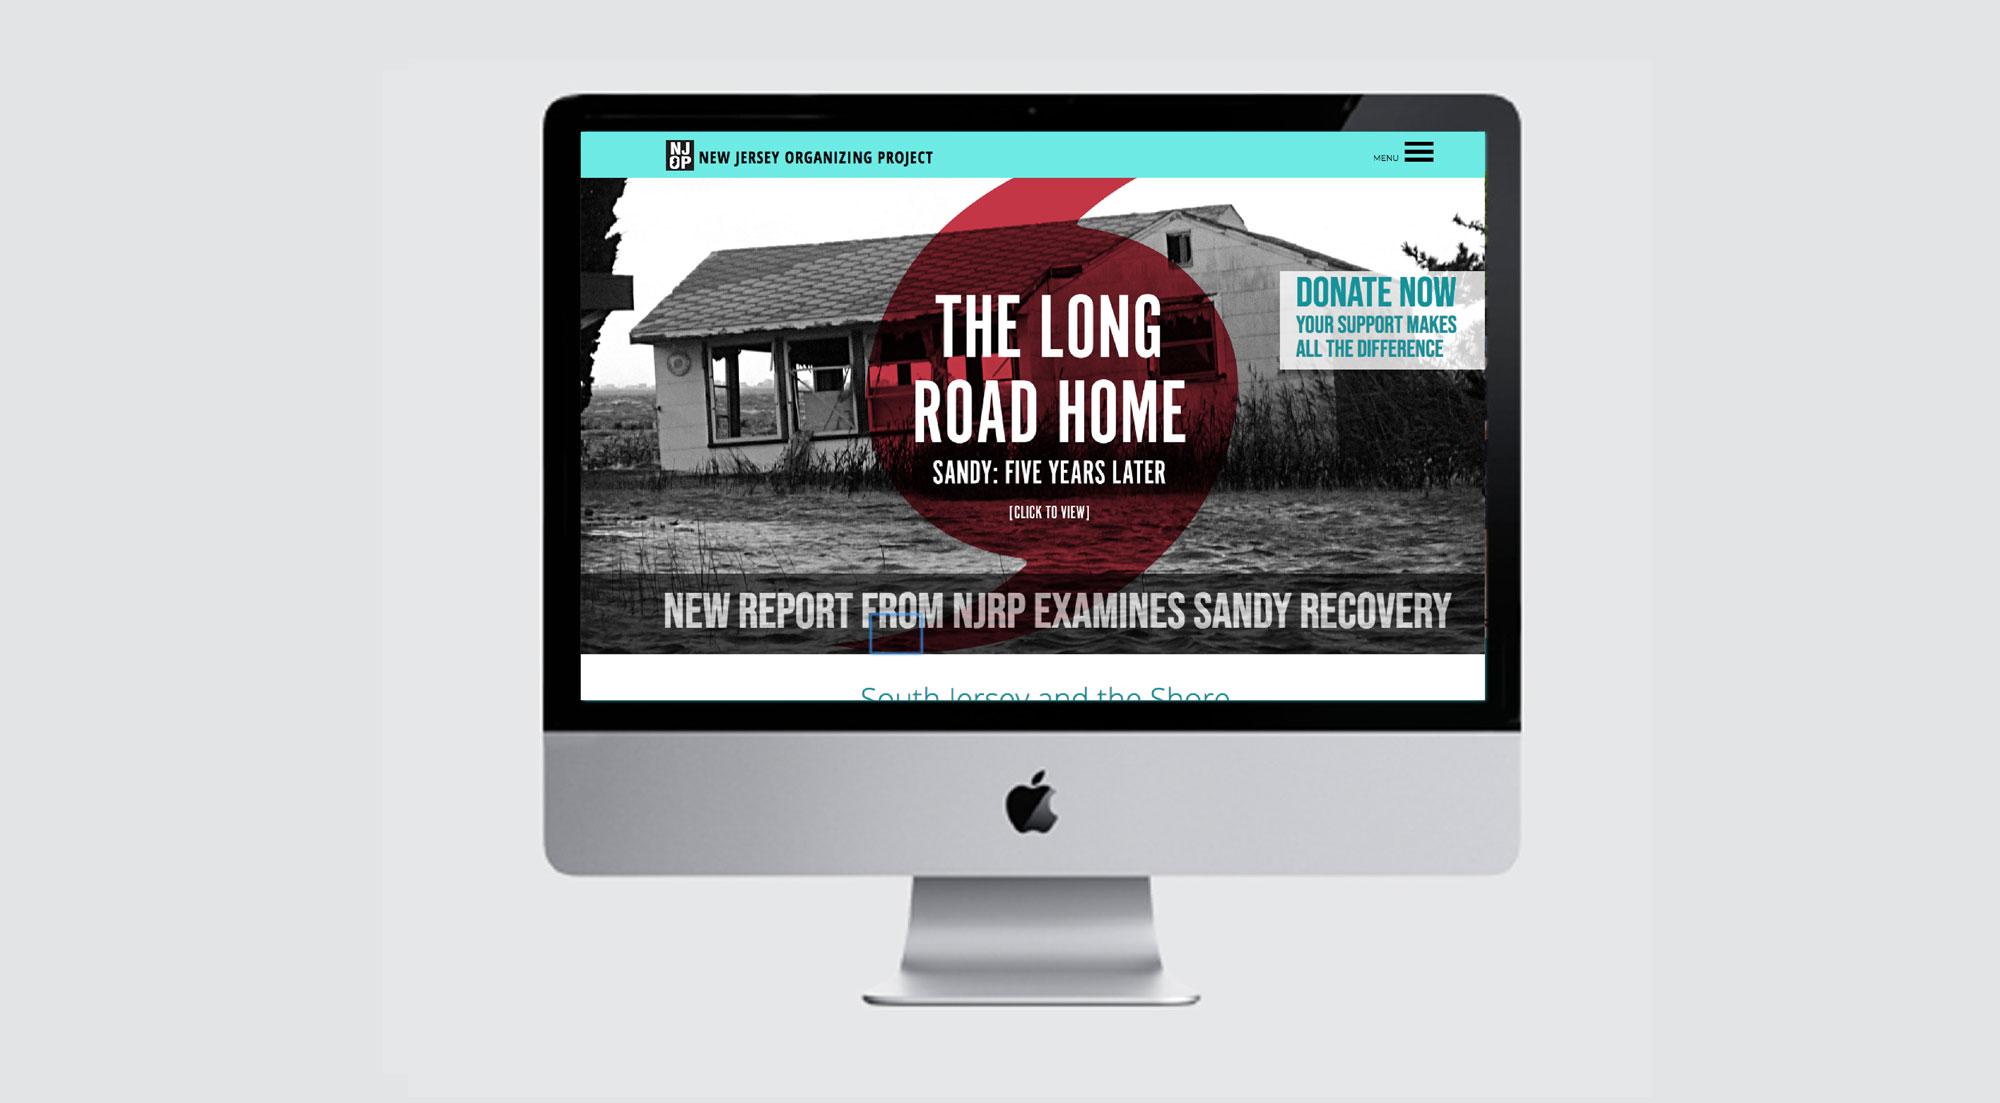 grass-creative-branding-identity-responsive-website-design-art-direction-non-profit-NJOP.jpg